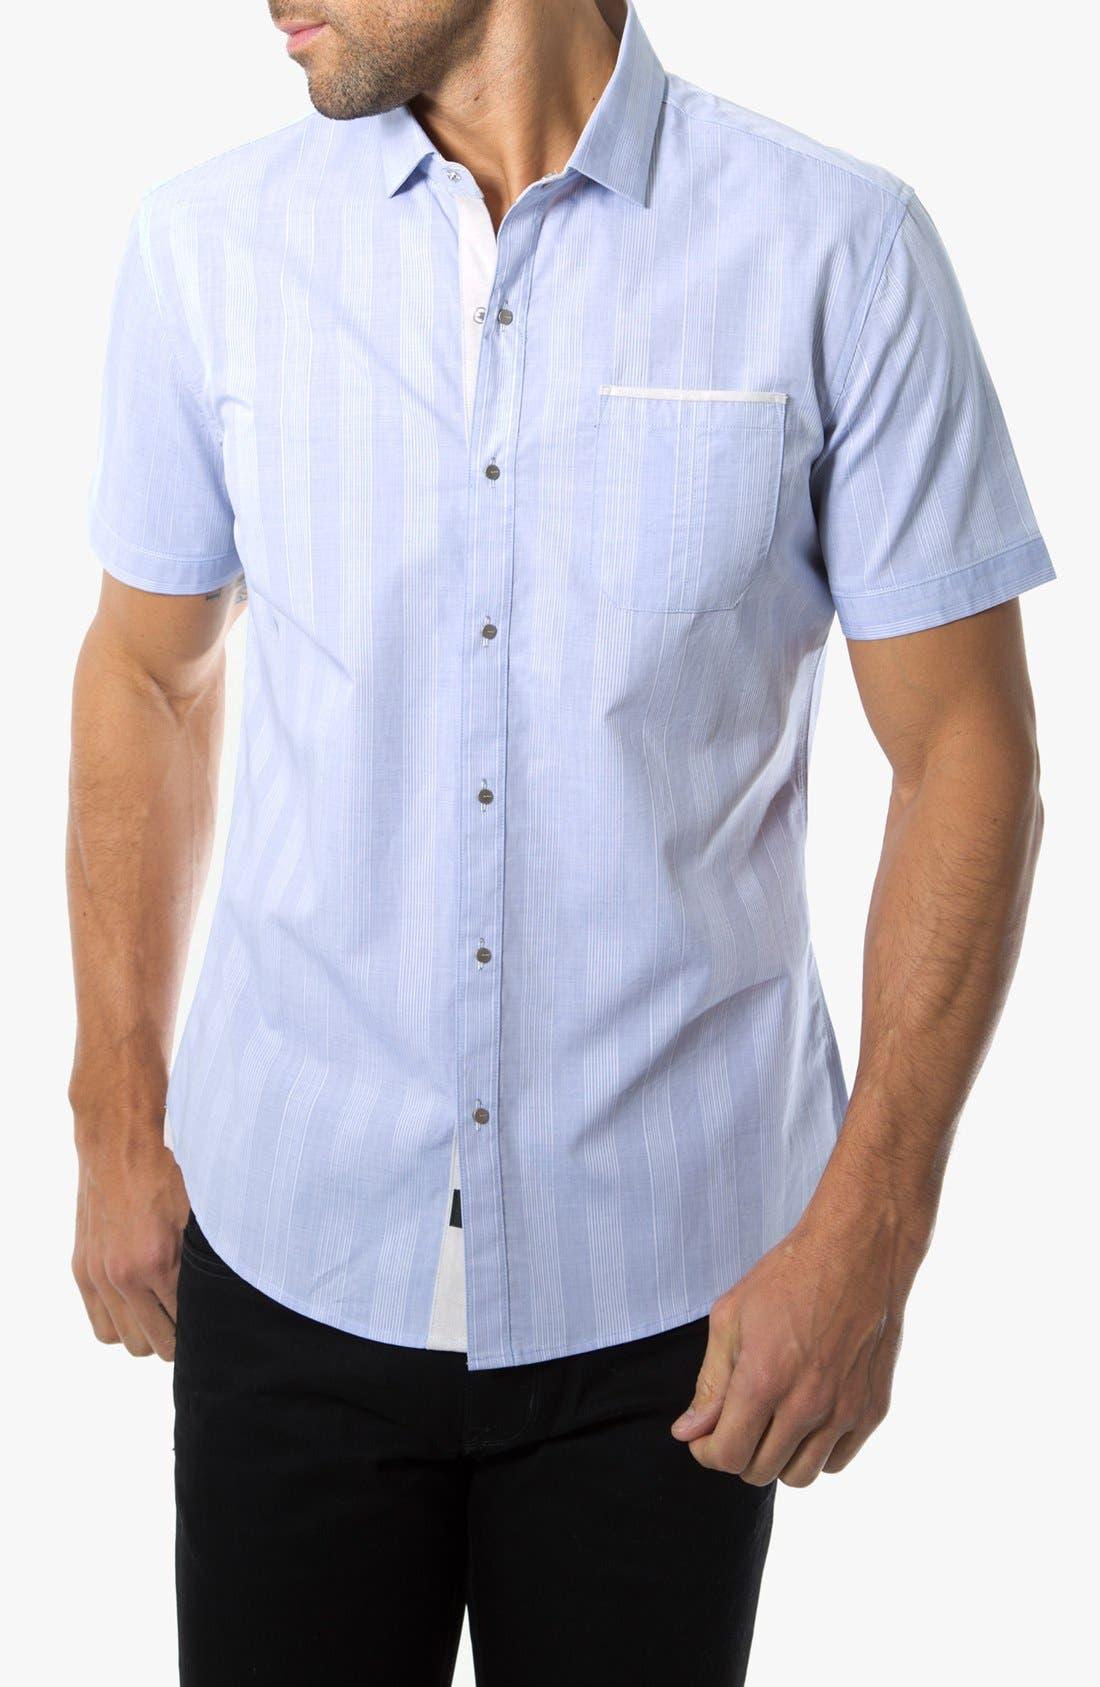 Main Image - 7 Diamonds 'Hilltop Party' Striped Woven Short Sleeve Shirt